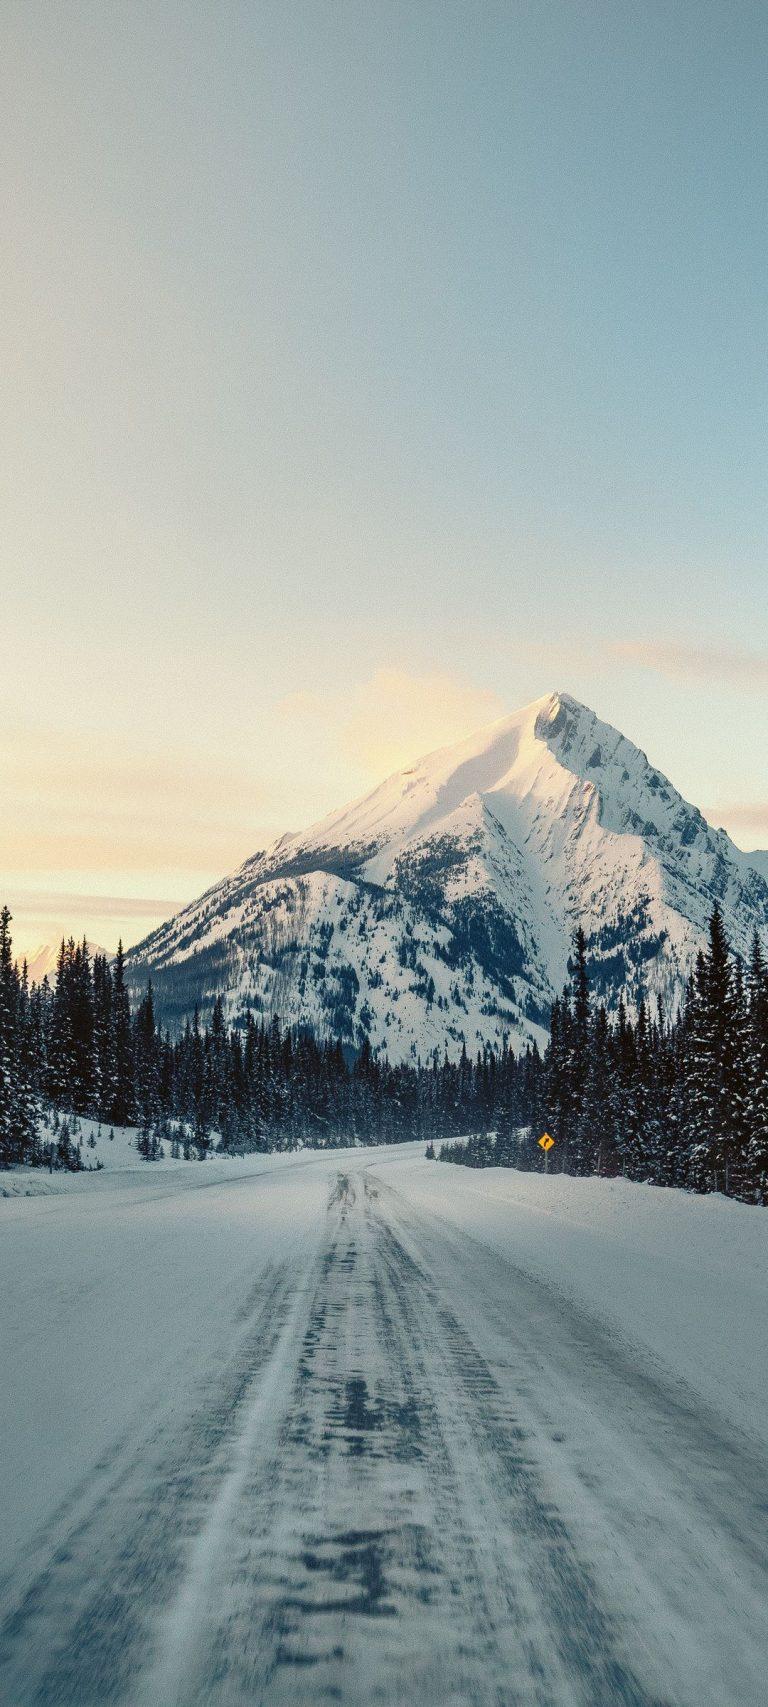 Mountain Road Snow Nature 1080x2400 768x1707